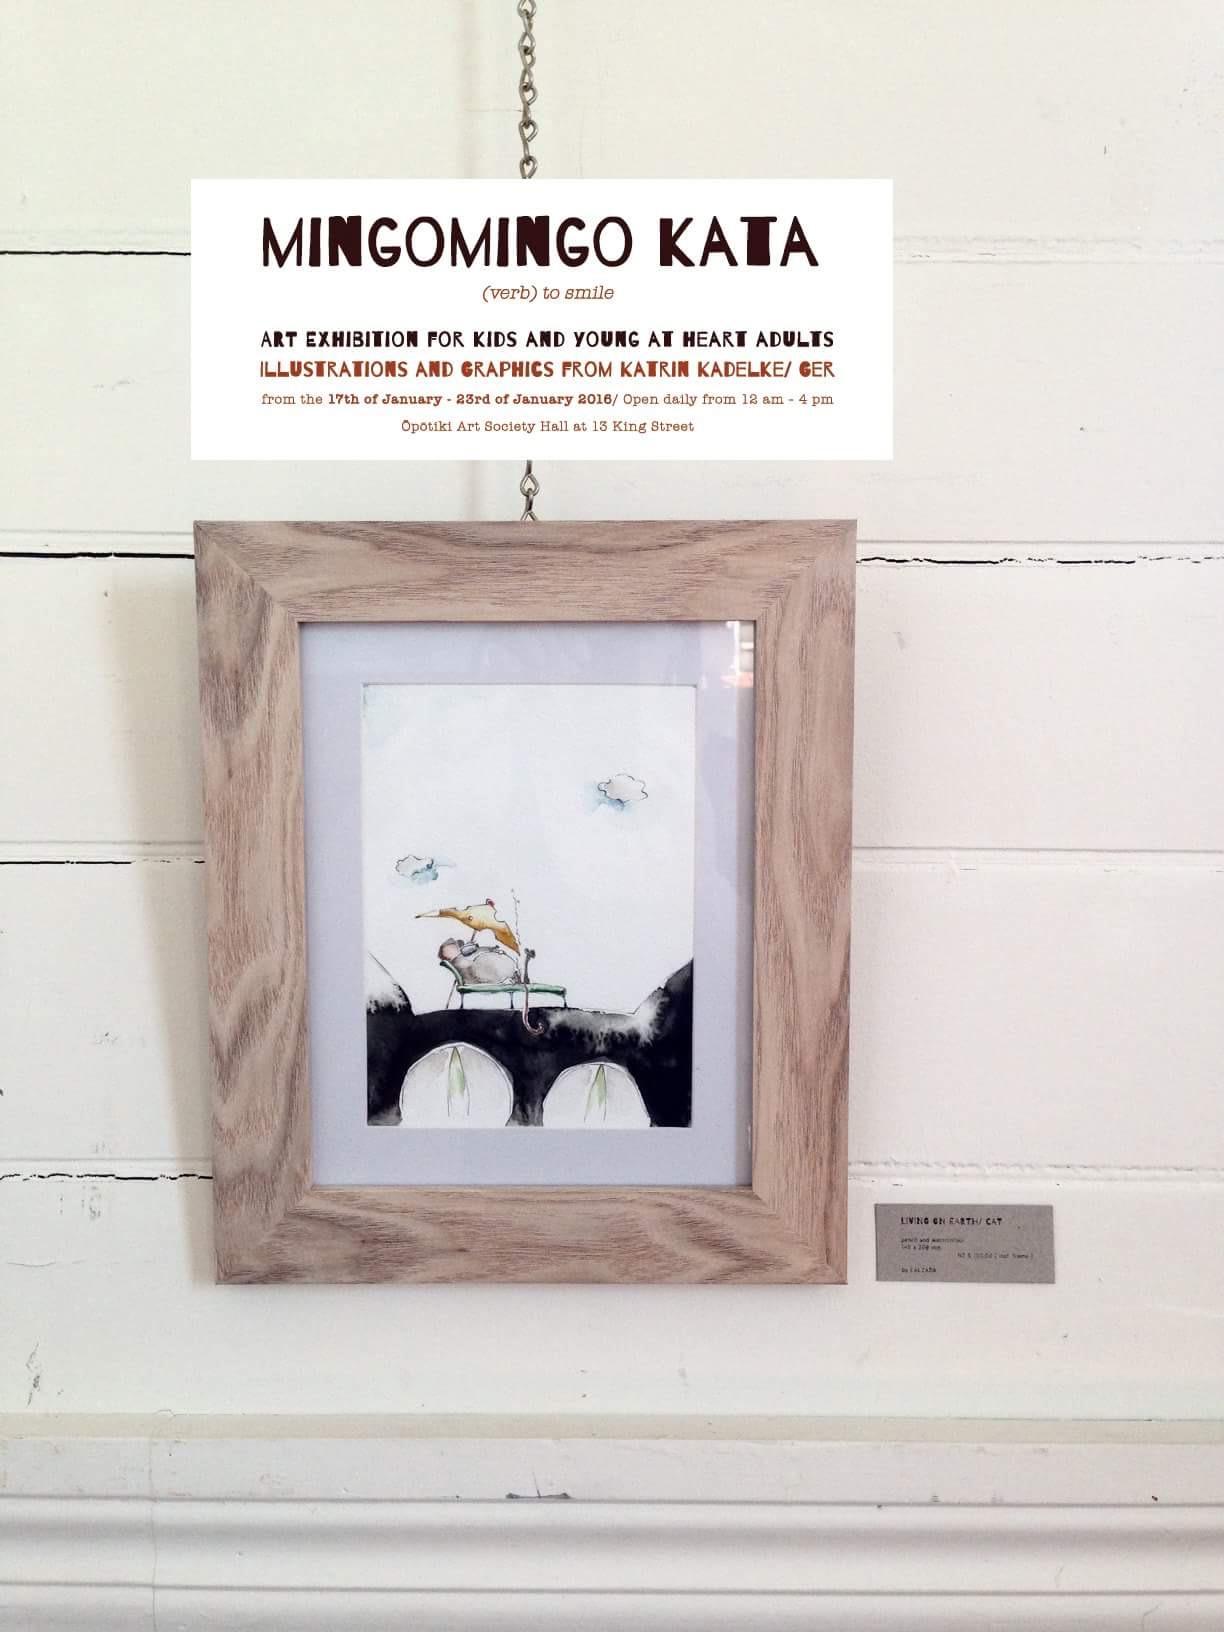 MINGOMINGO KATA